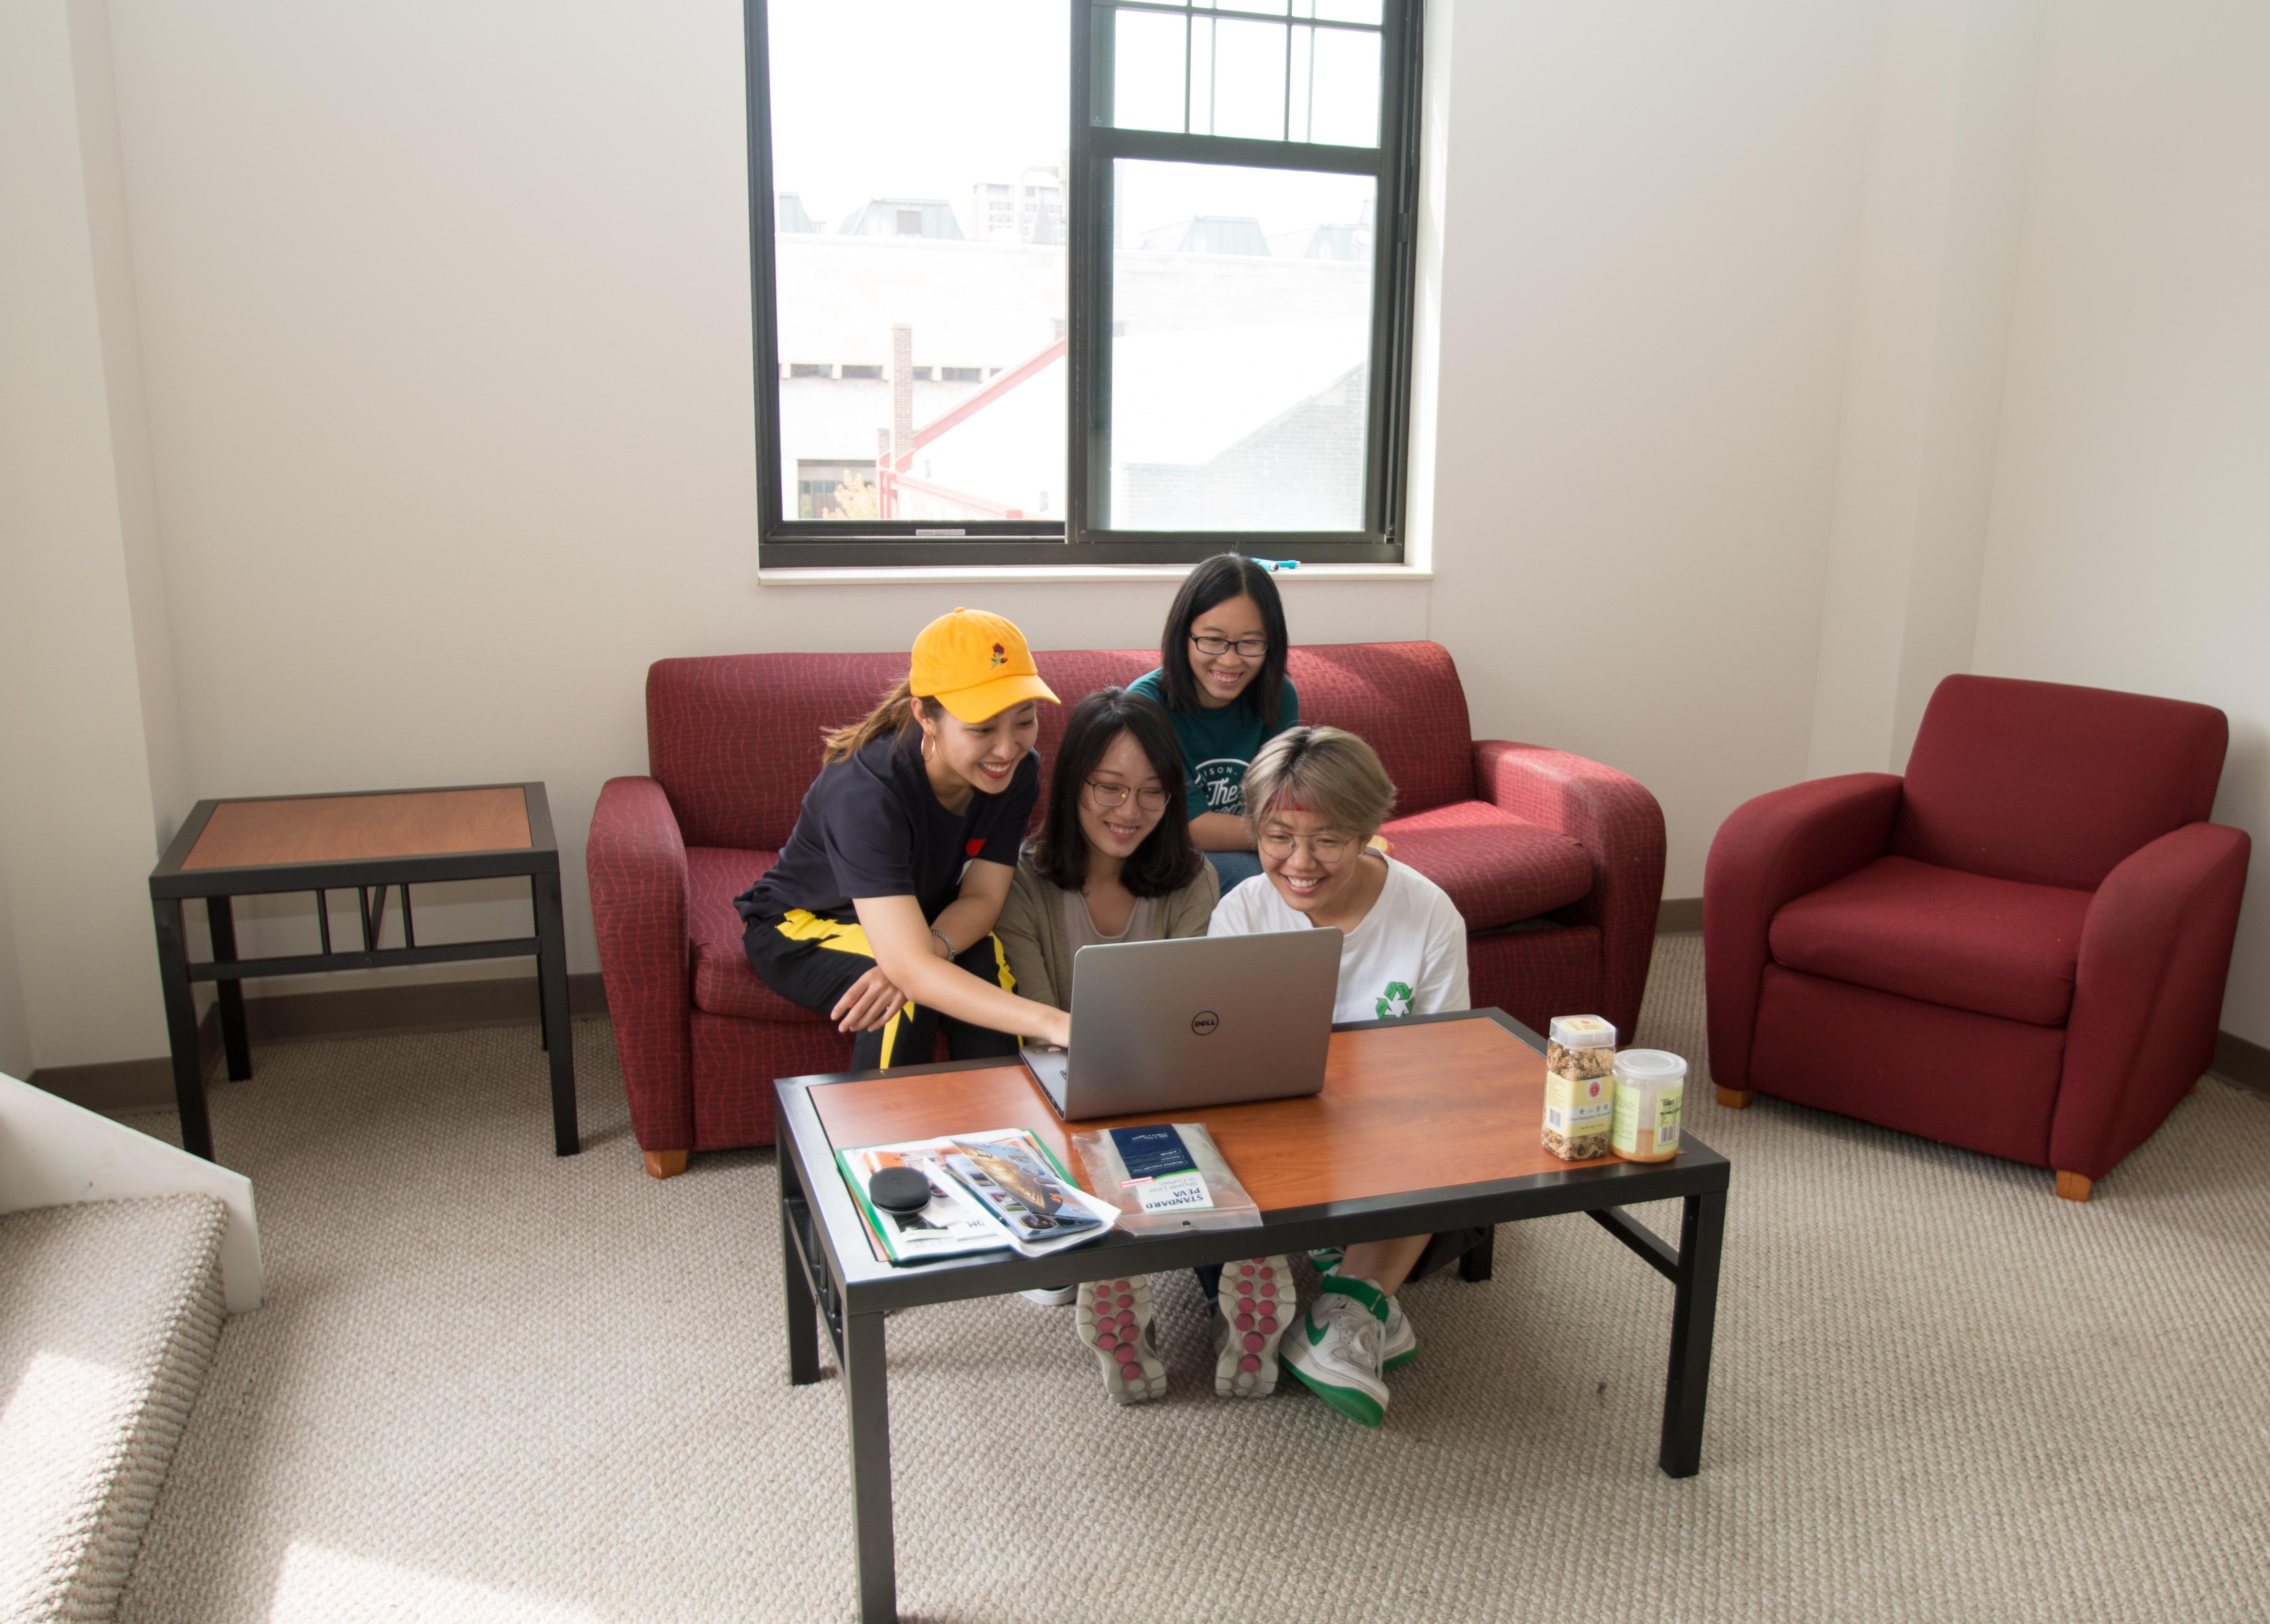 Girls Looking At Computer